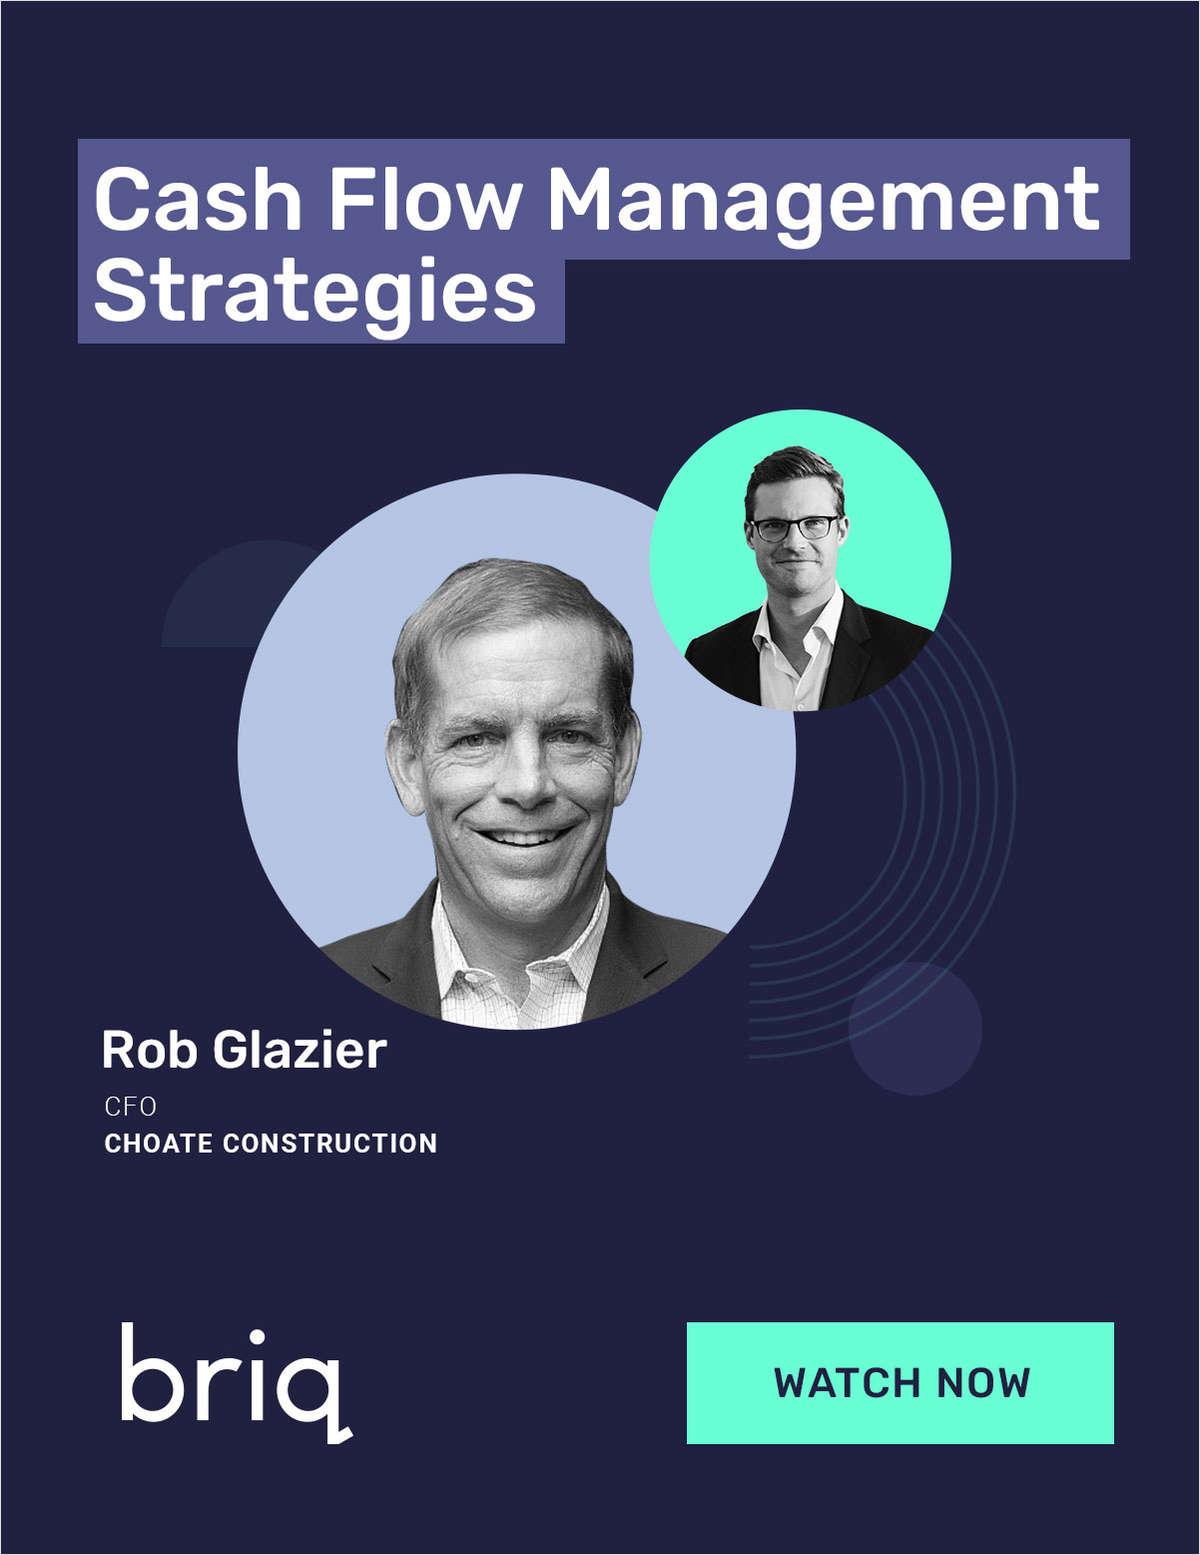 Cash Flow Management Best Strategies In Construction